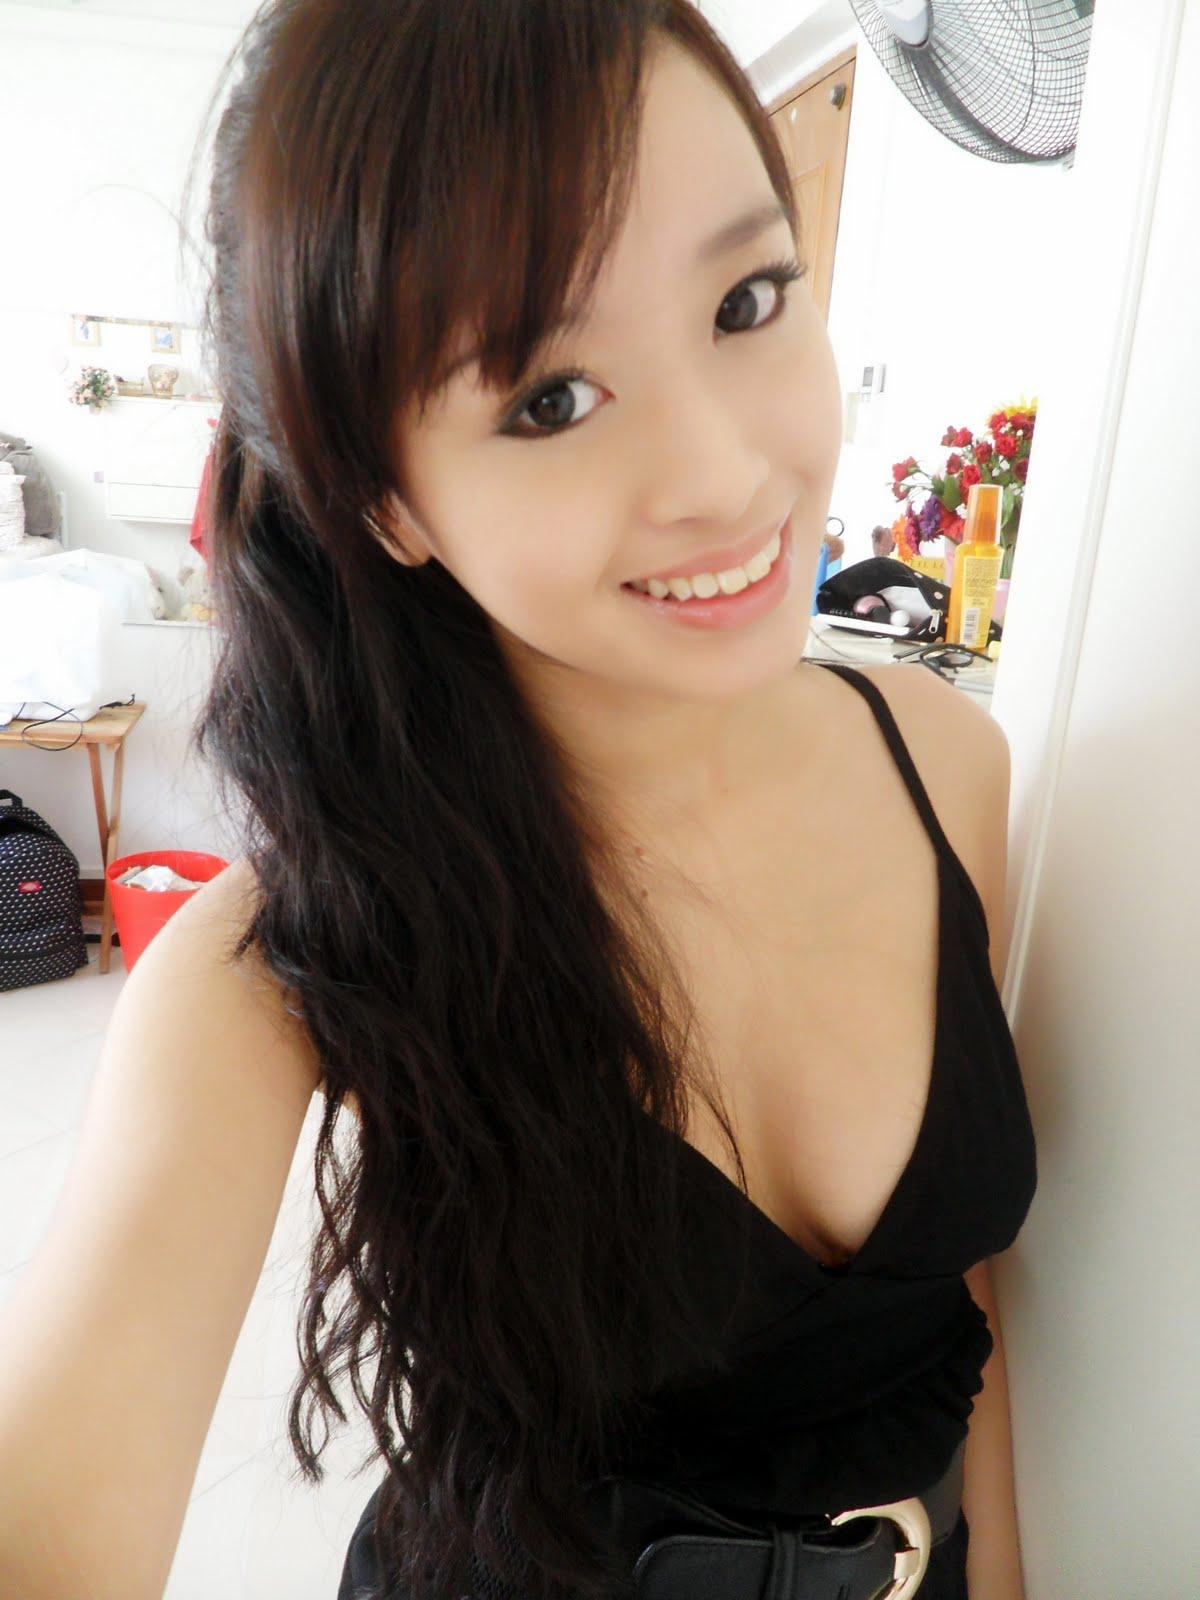 Pretty Singapore Girls - Audrey - [19/06/2010] - Saturday